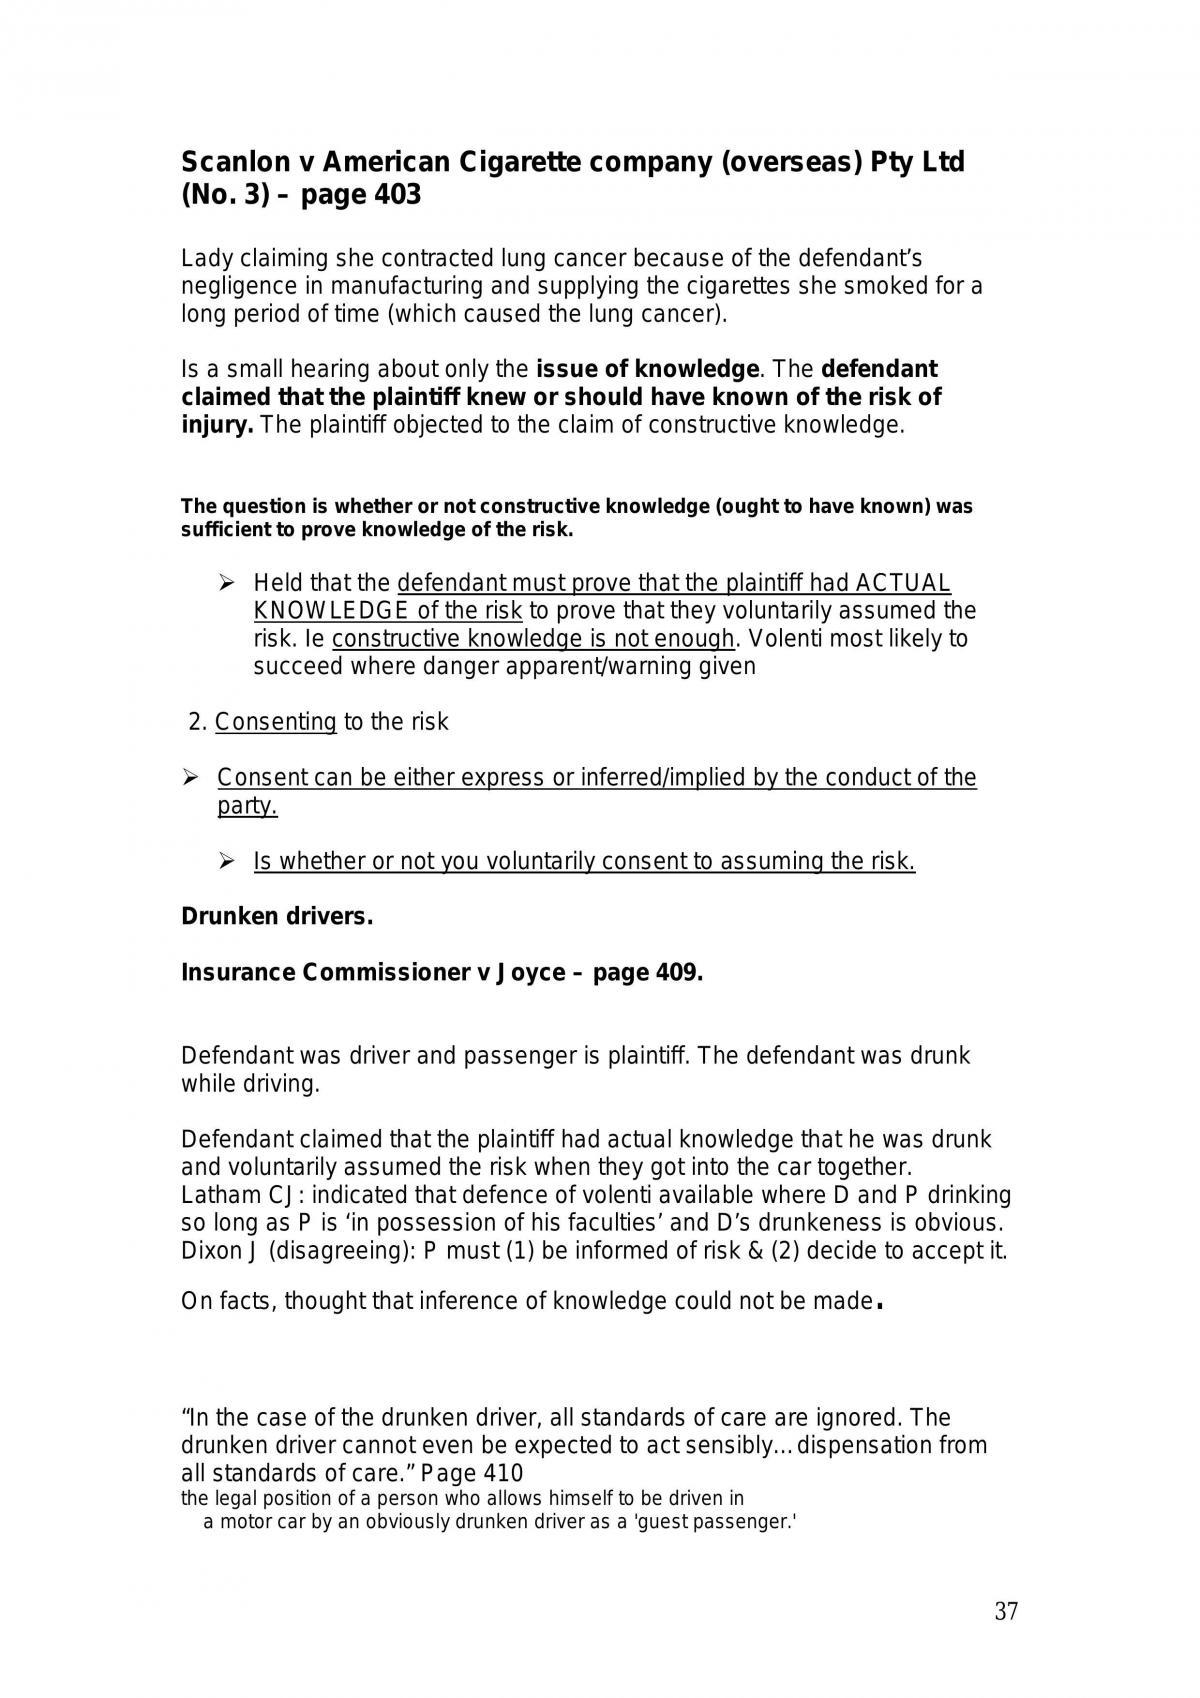 Torts Summary - Page 37